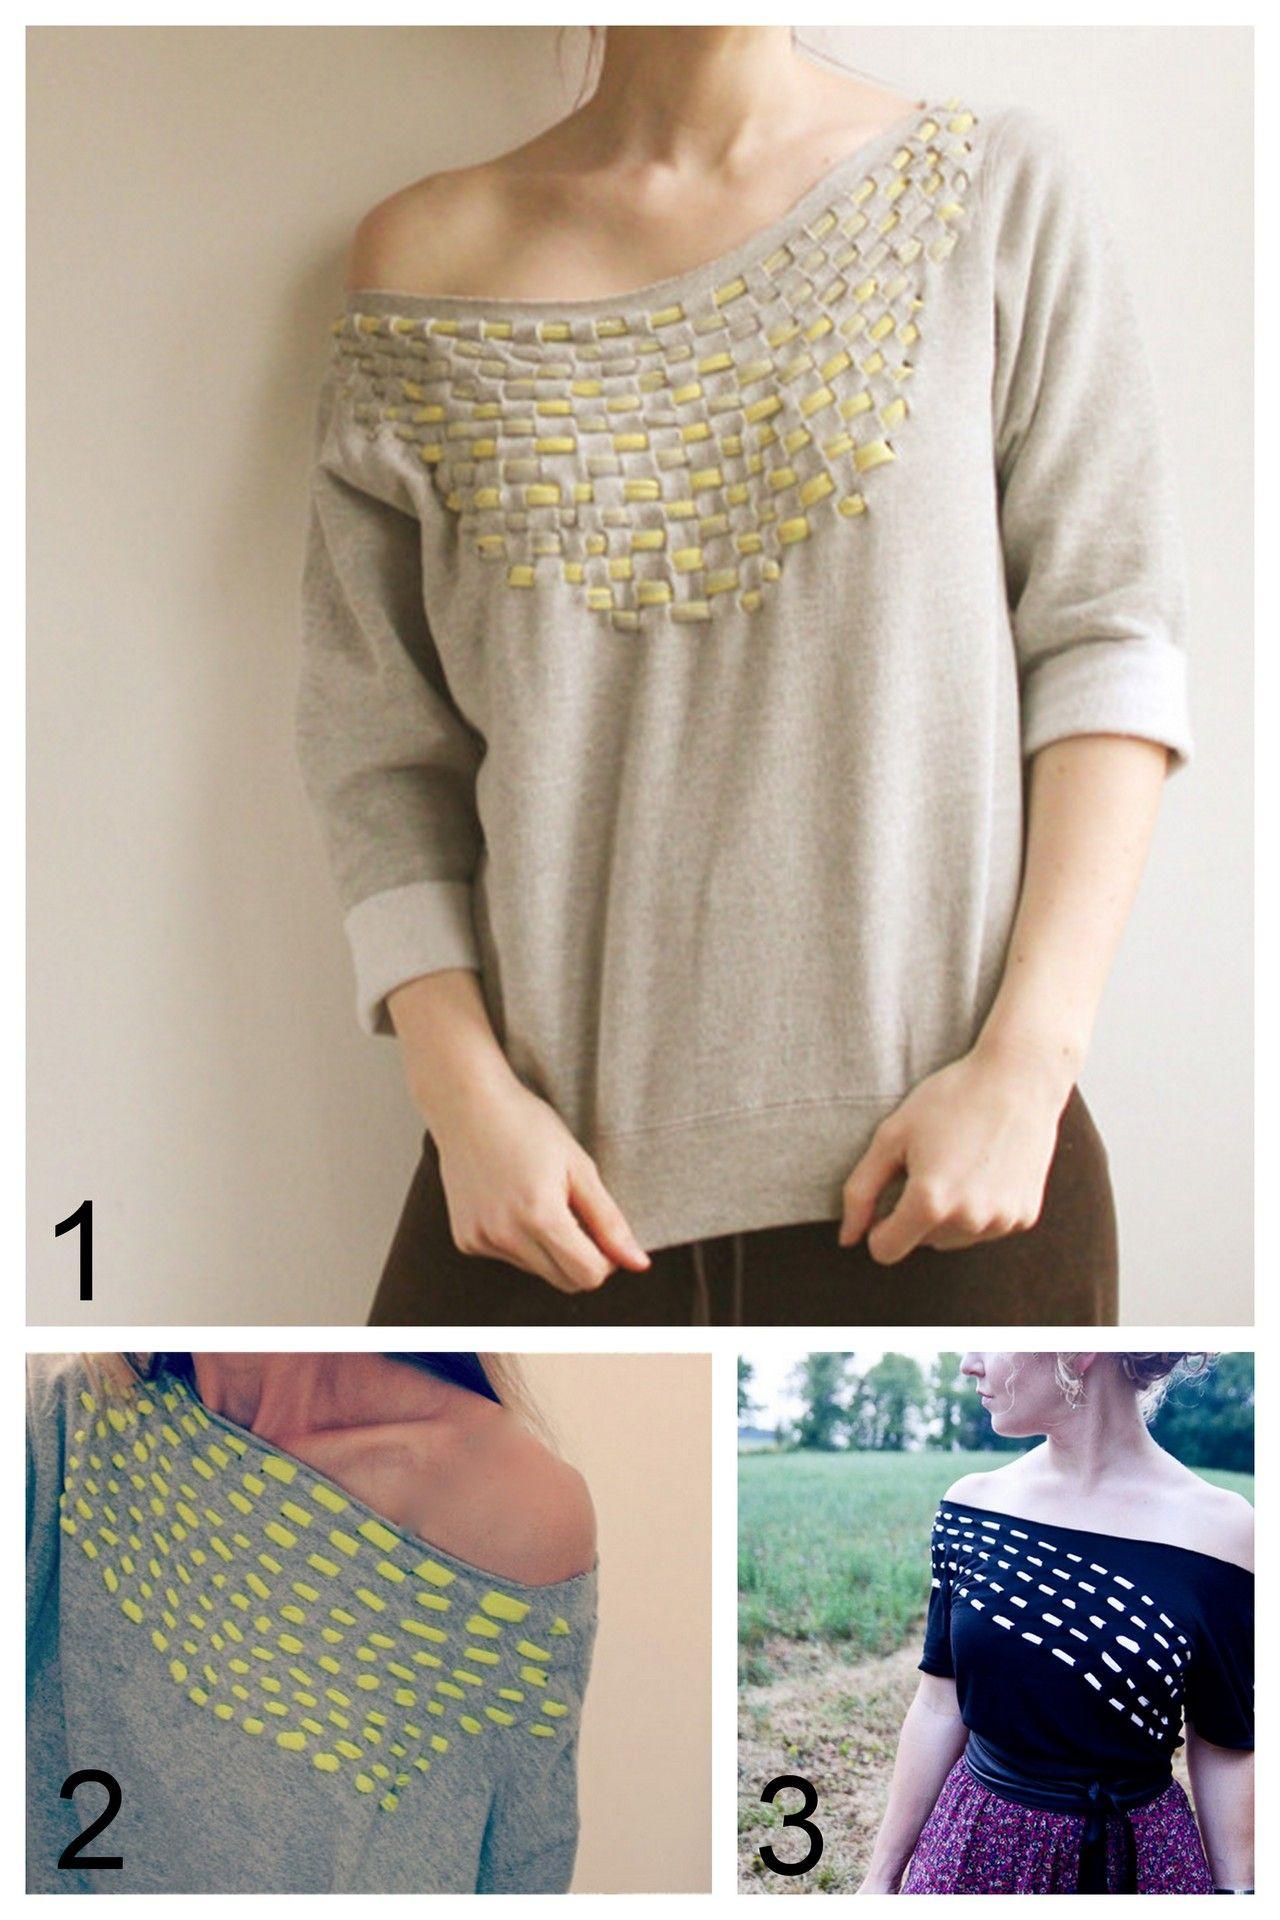 Three Woven Shirt Tutorials